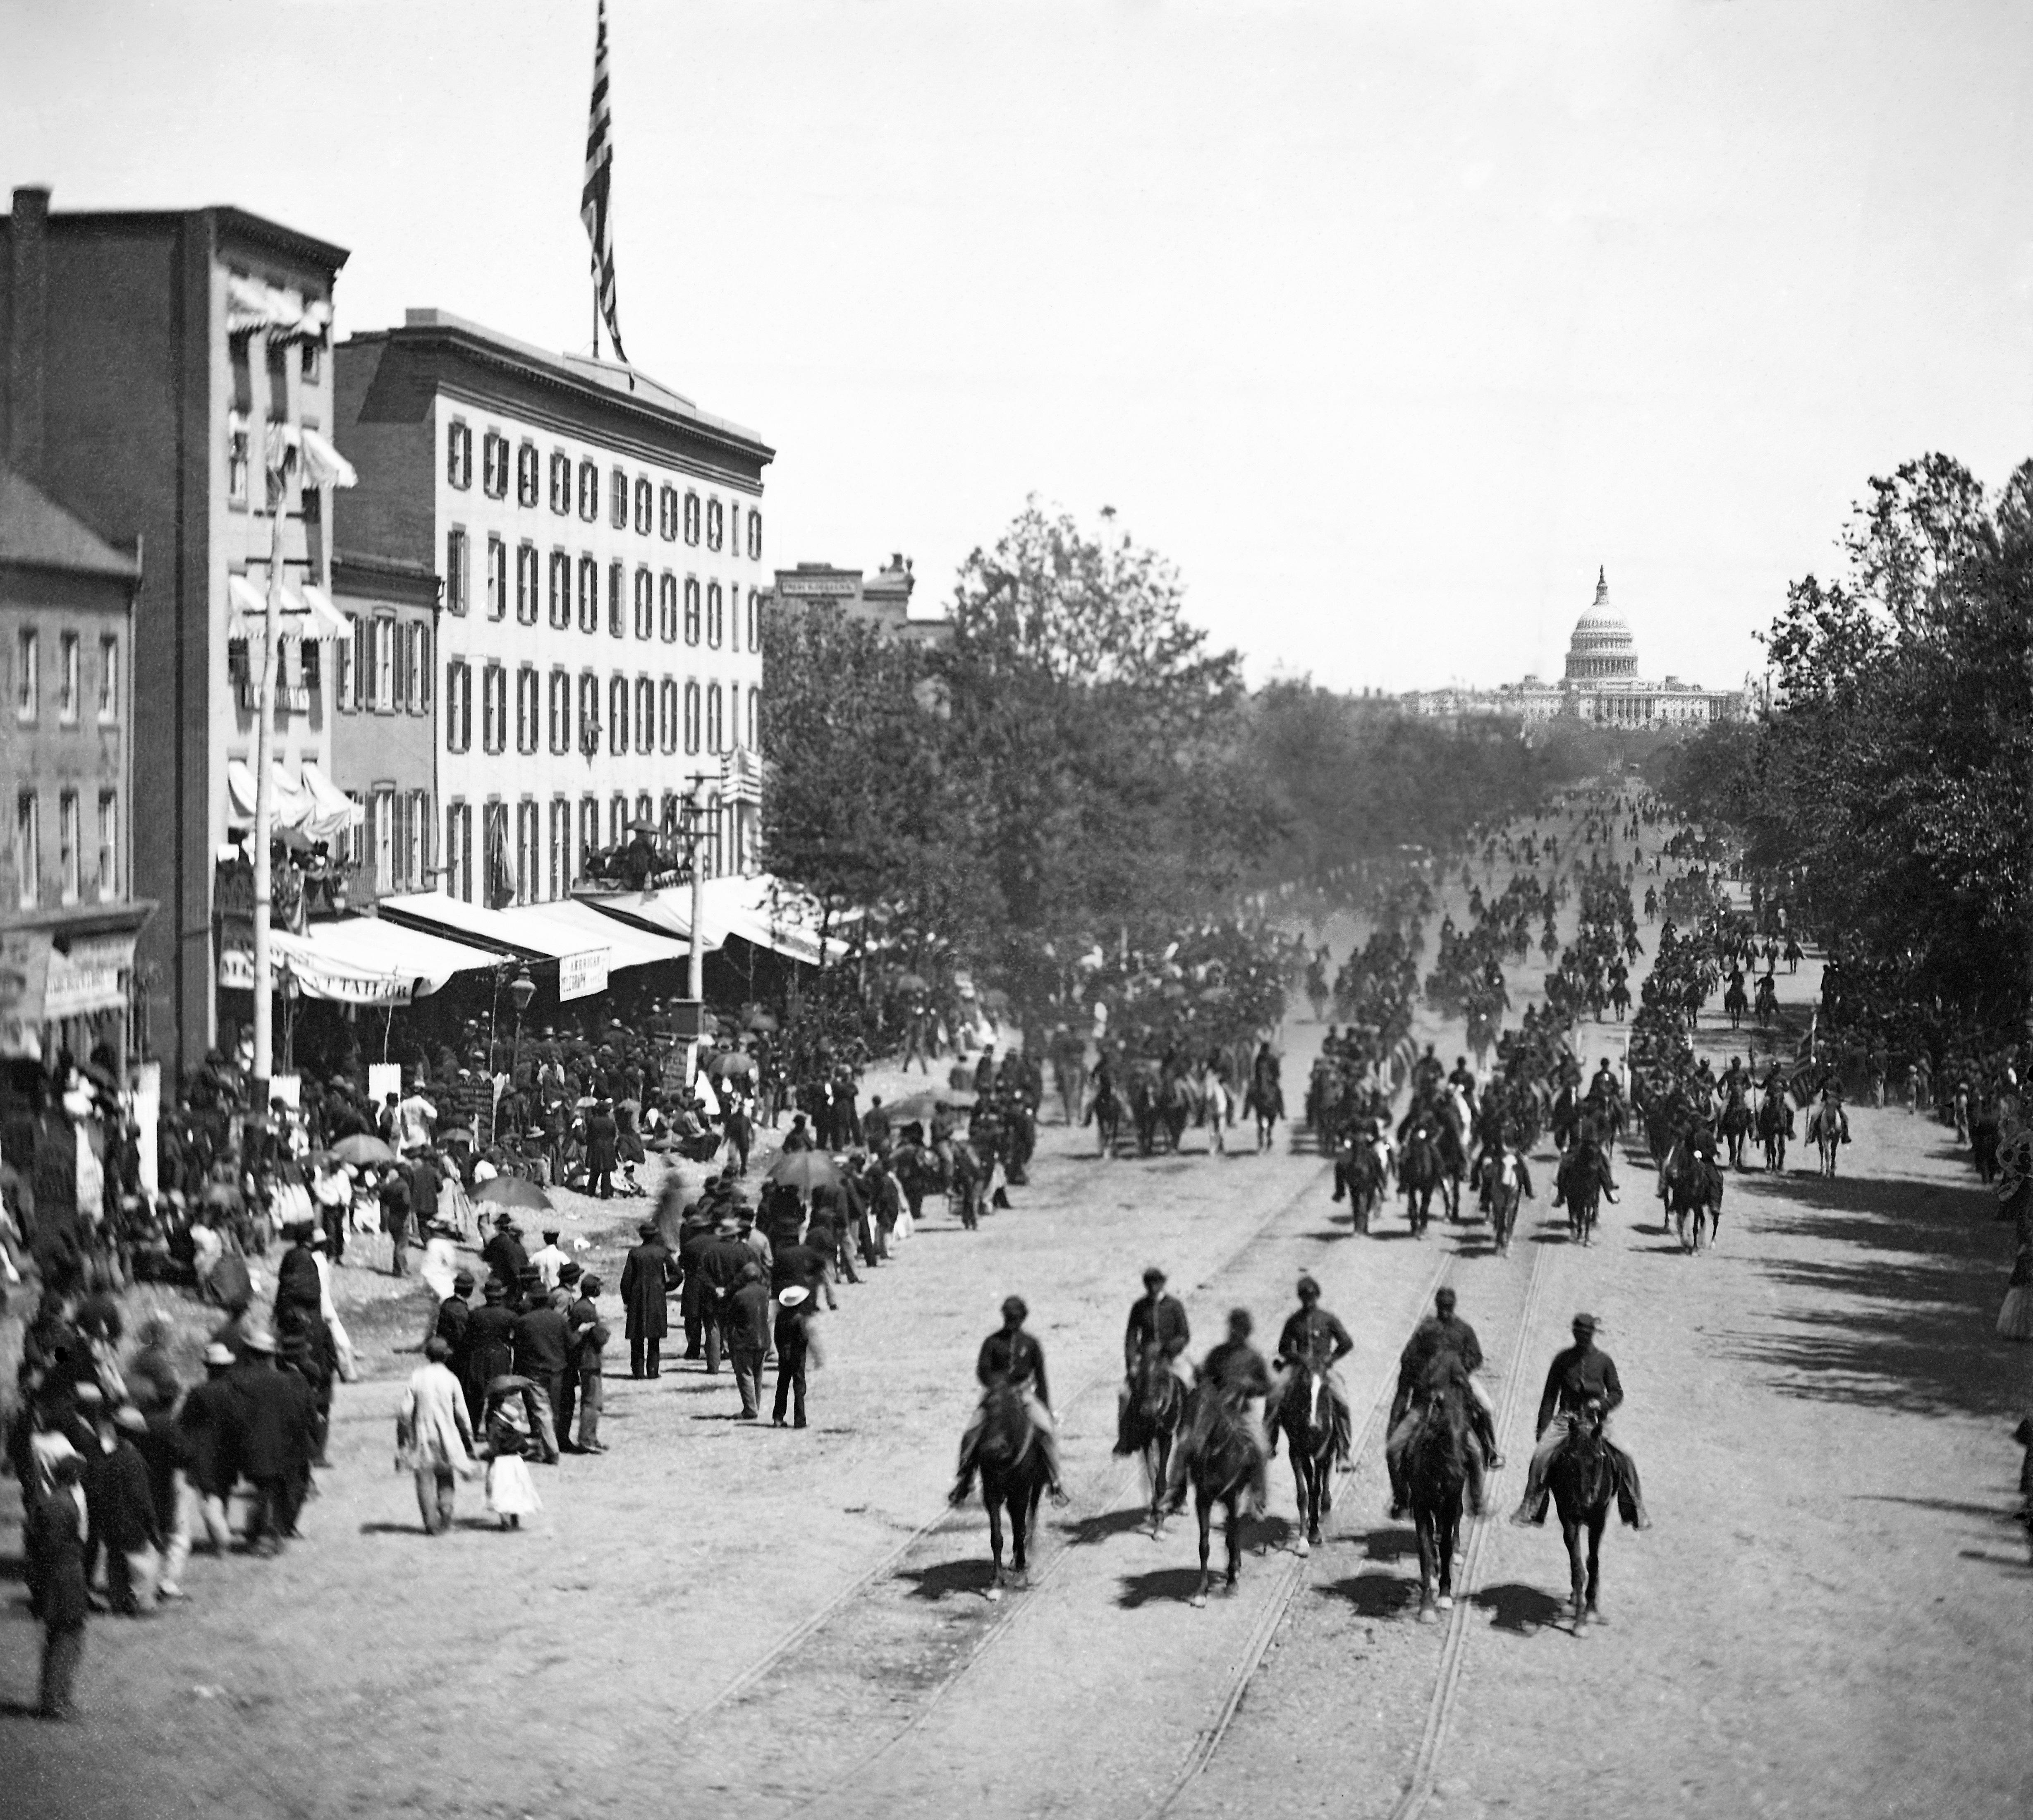 File:Penn Ave May 1865 - restored.jpg - Wikimedia Commons